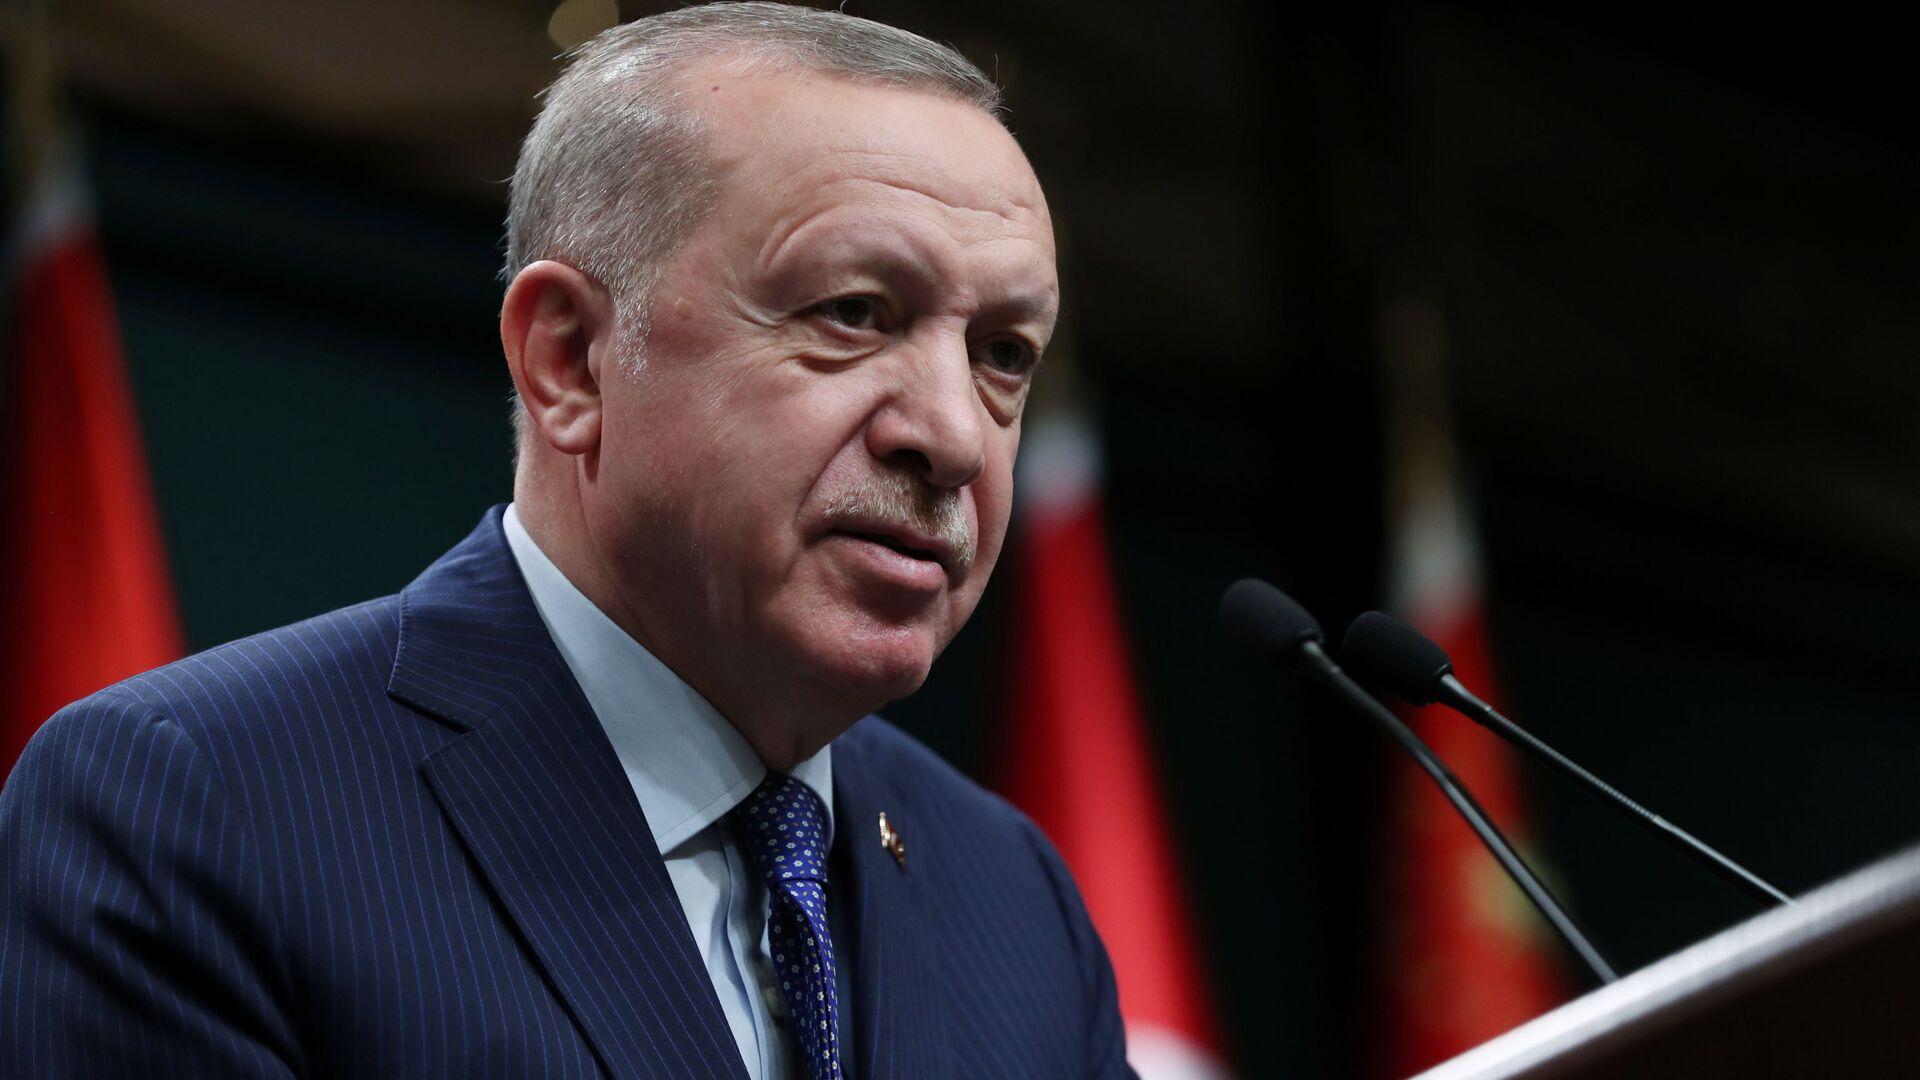 Turecký prezident Recep Tayyip Erdogan - Sputnik Česká republika, 1920, 20.07.2021